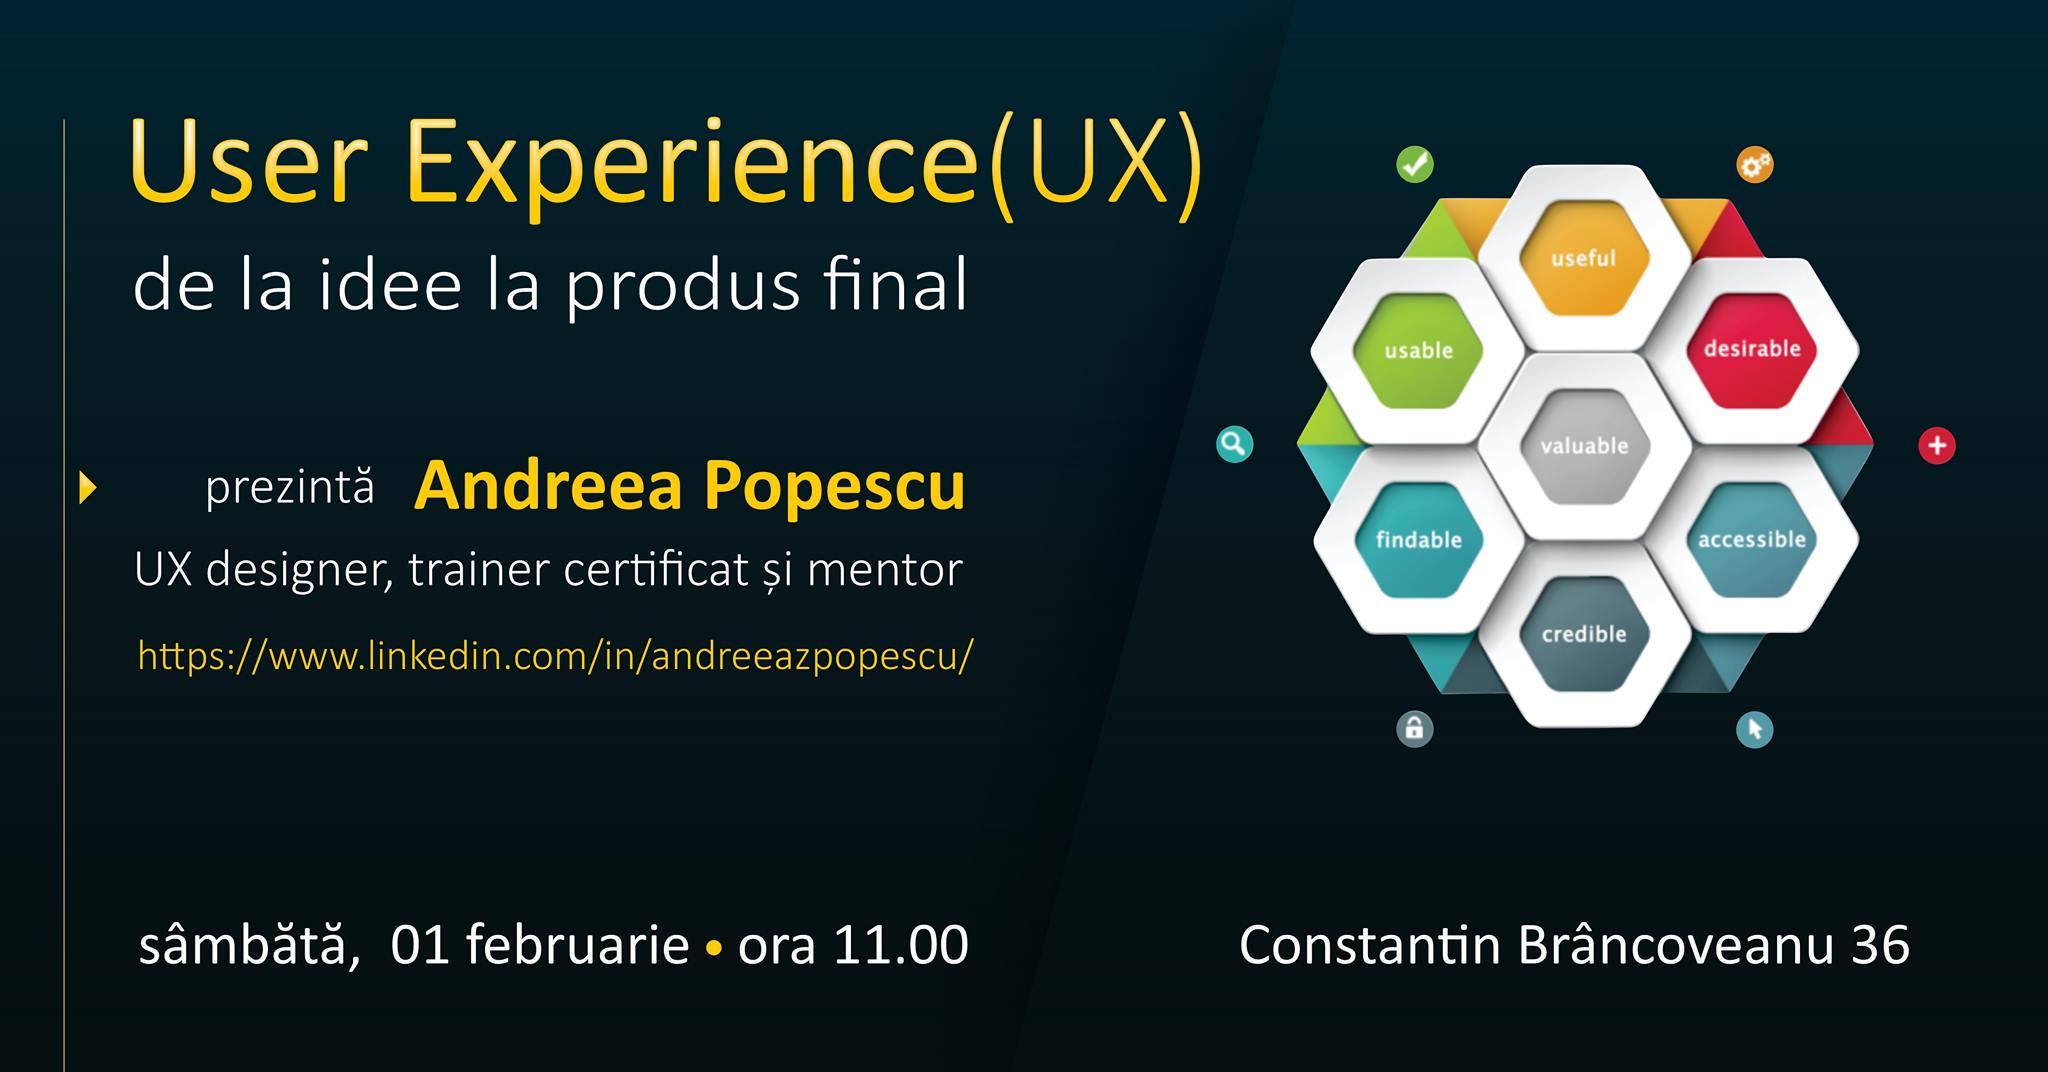 User Experience (UX): de la idee la produs final